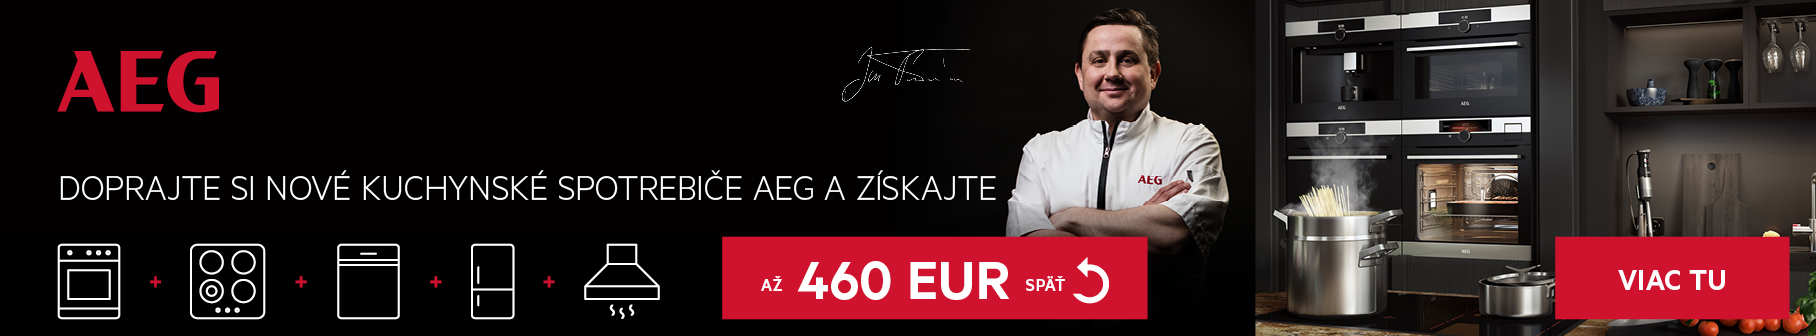 Doprajte si nové kuchynské spotrebiče AEG